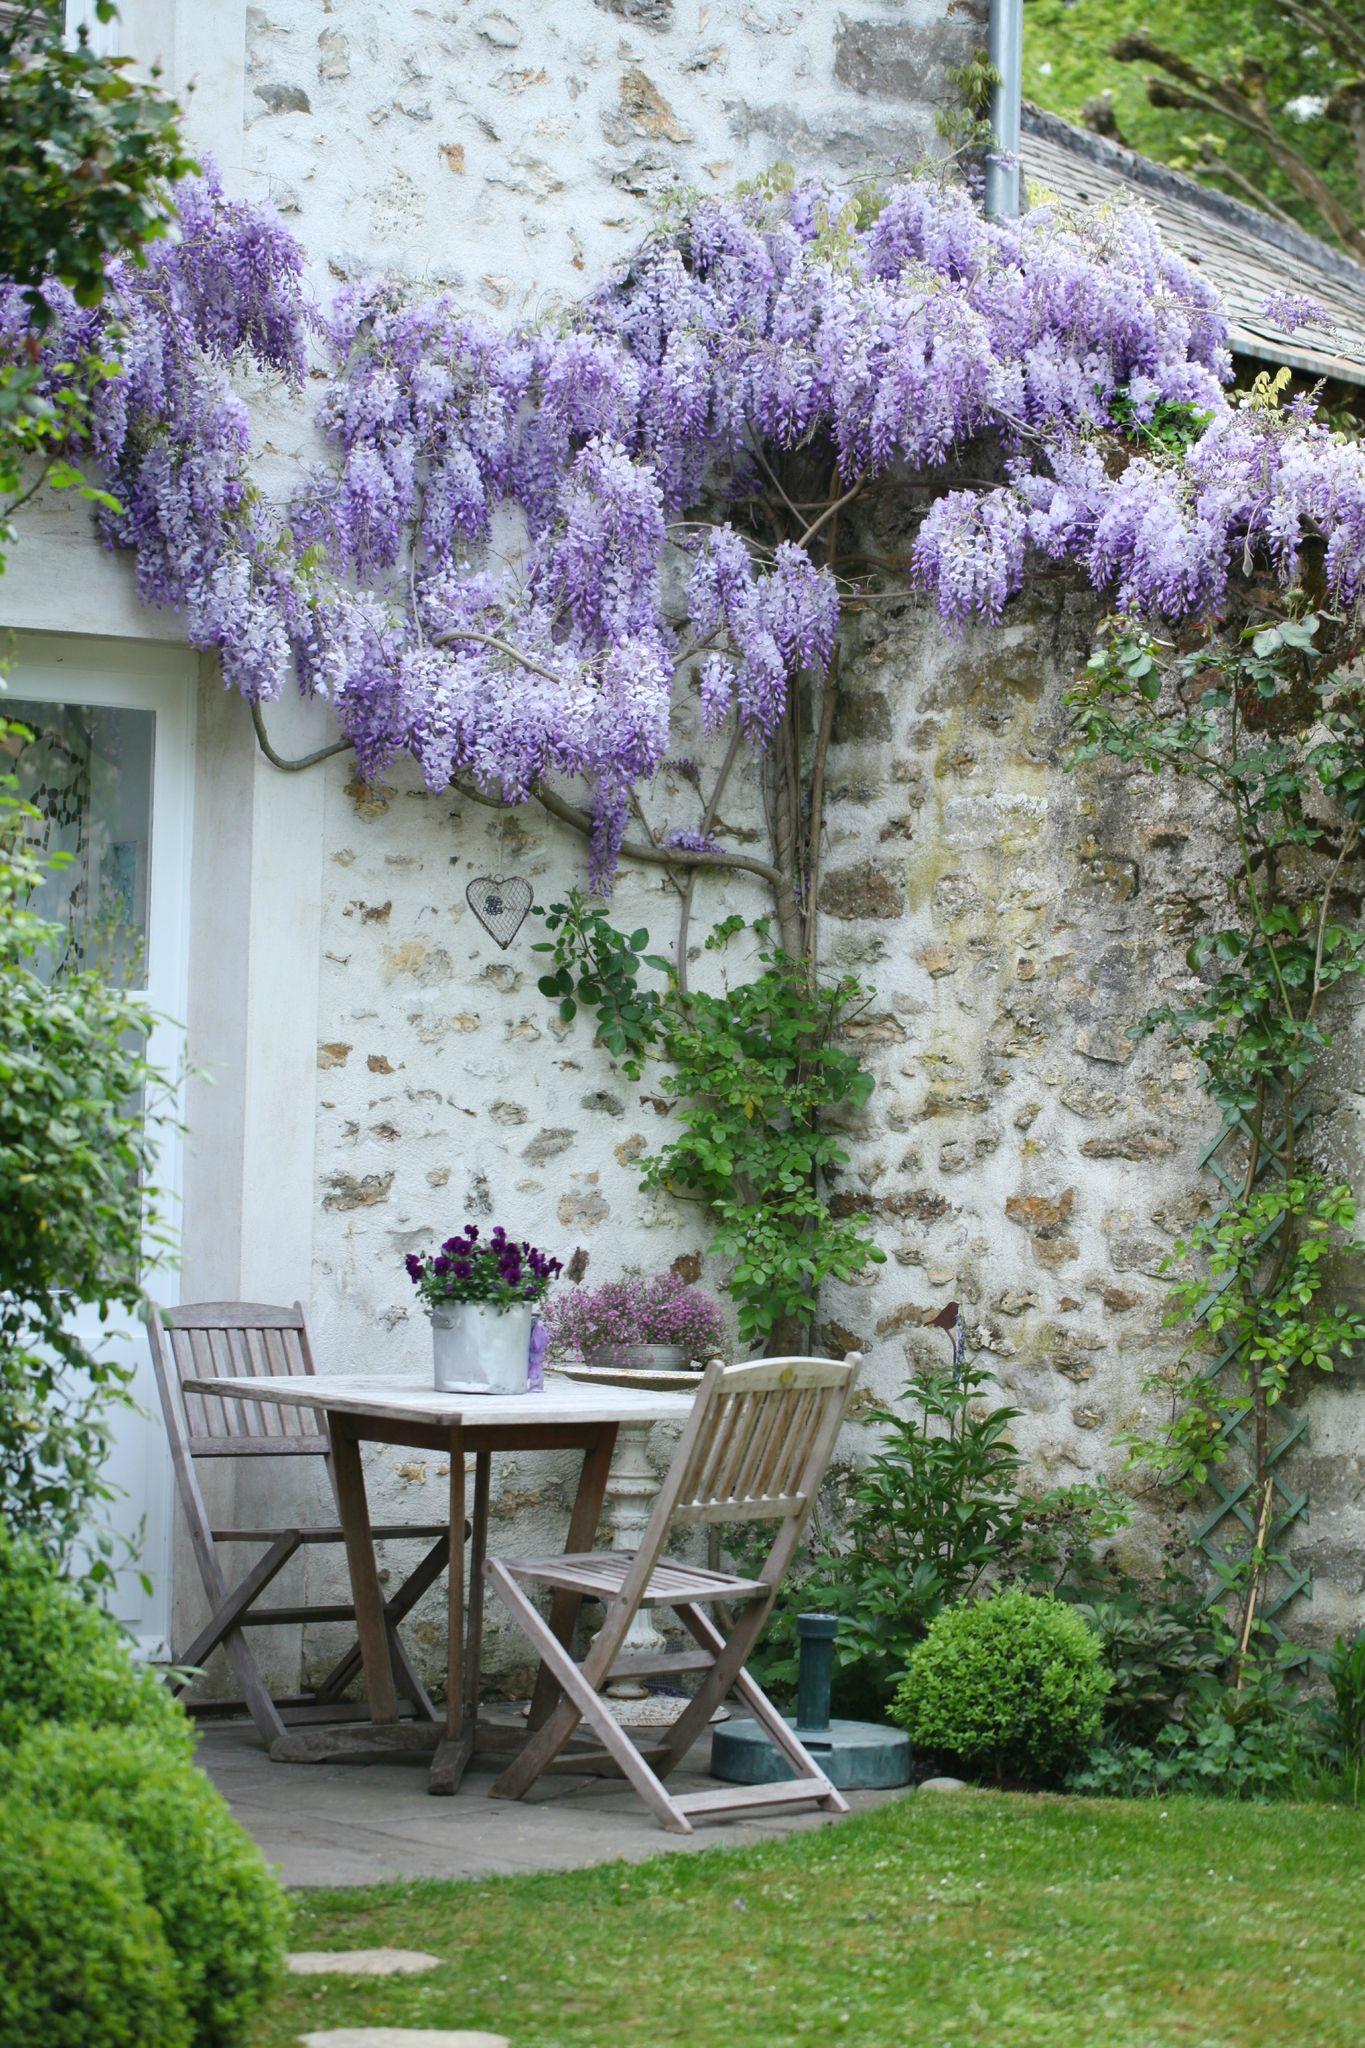 un tour au jardin ... - Grange de charme | Gardens, Wisteria and ...